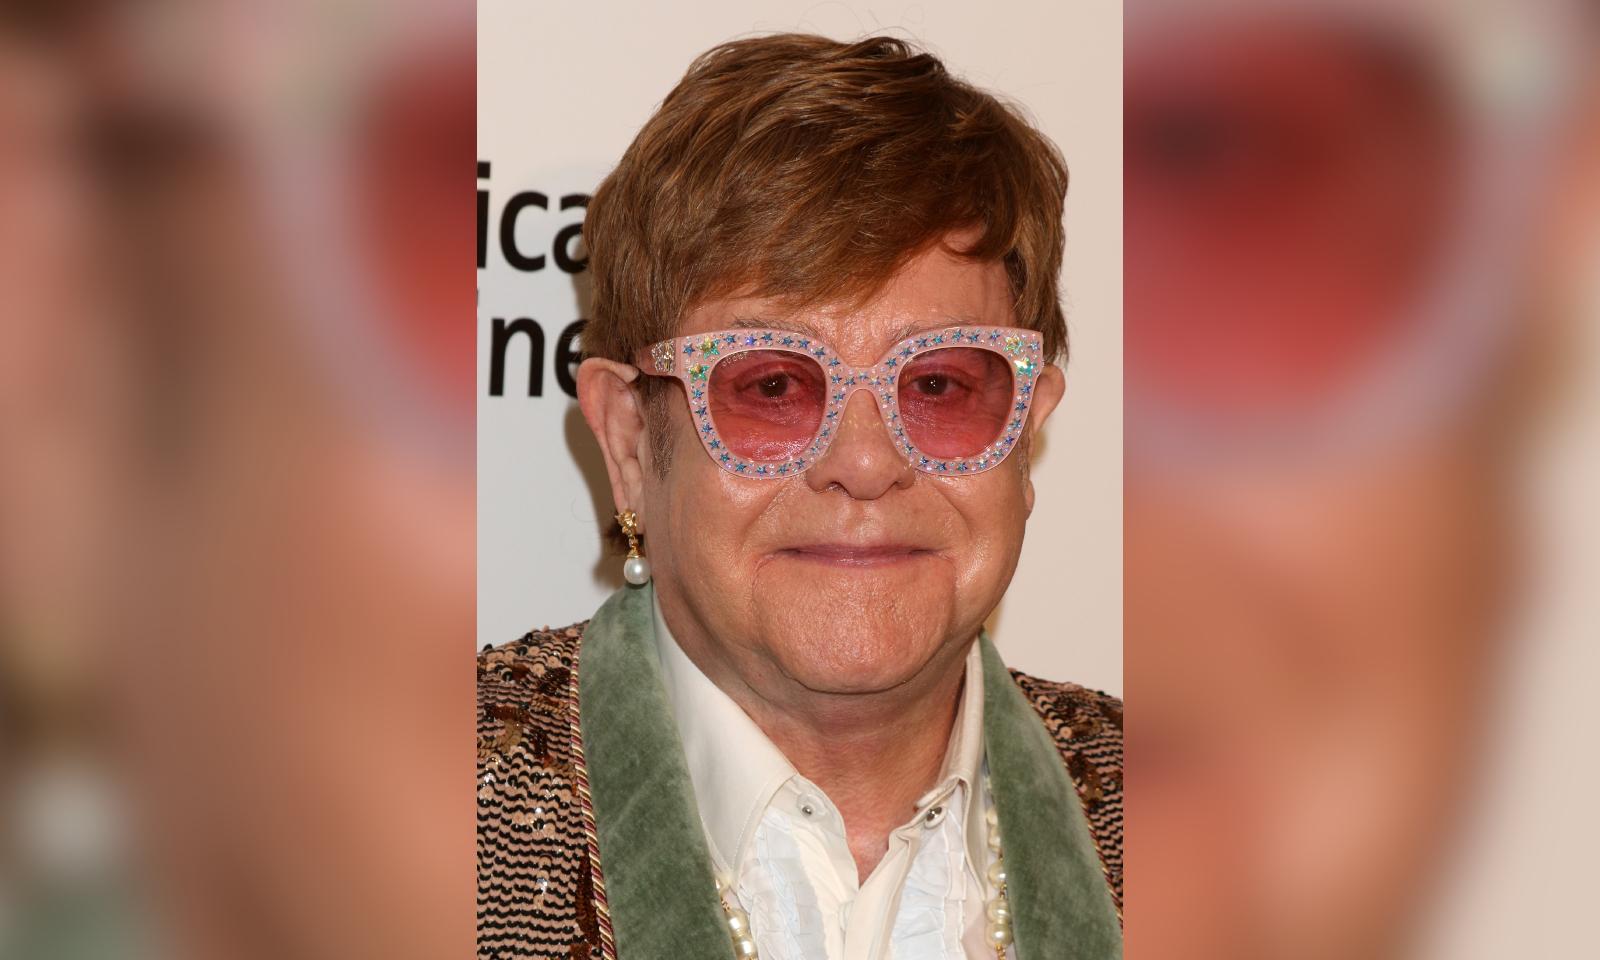 Elton John Slams Media Over Royal Family Coverage